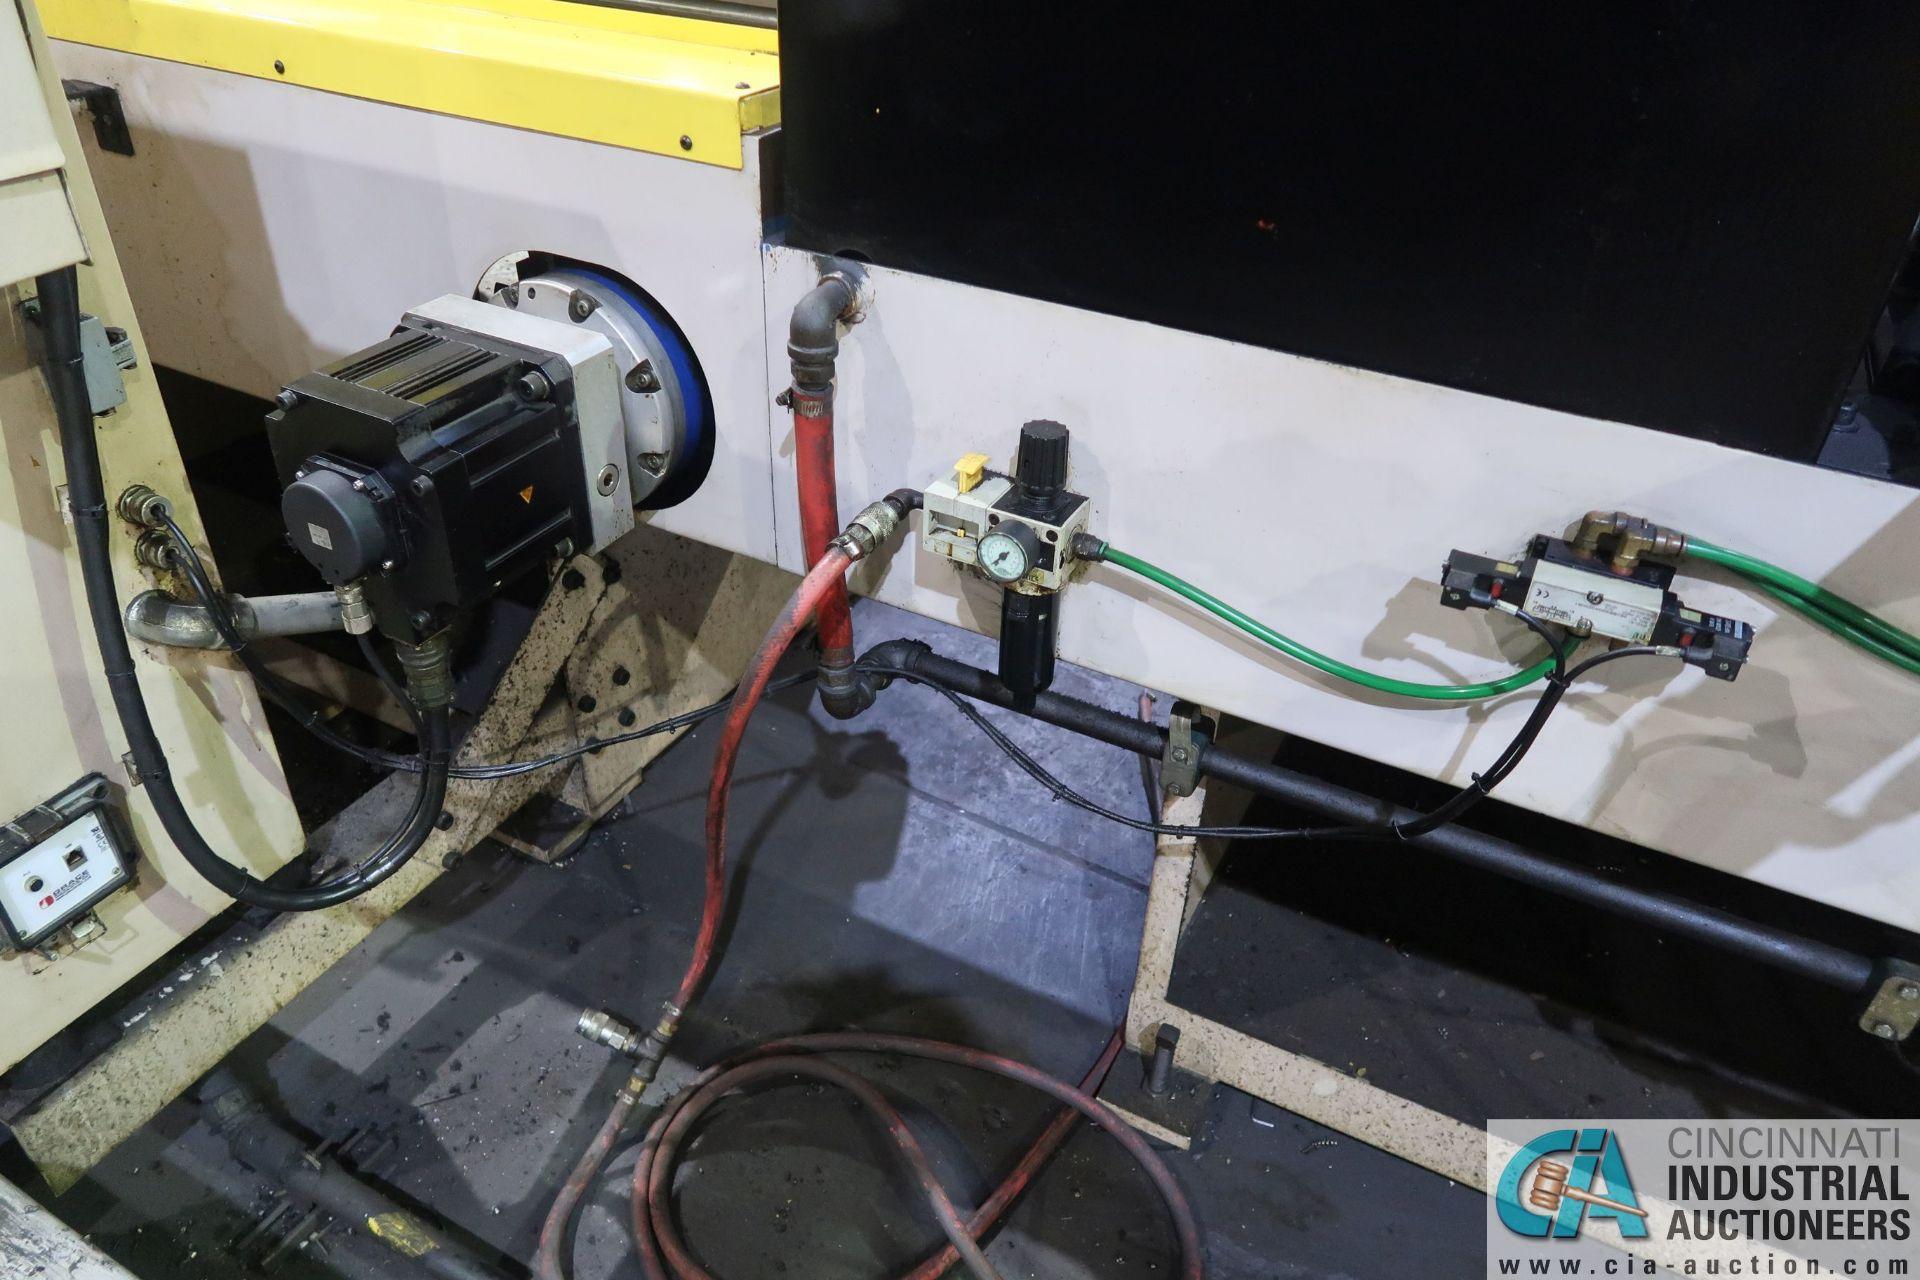 OHIO TOOL MODEL OTW-1000-5-2M PROGRAMMABLE HORIZONTAL HONE; S/N 22945, 6.5' STROKE, 5 HP DRIVE ( - Image 16 of 20